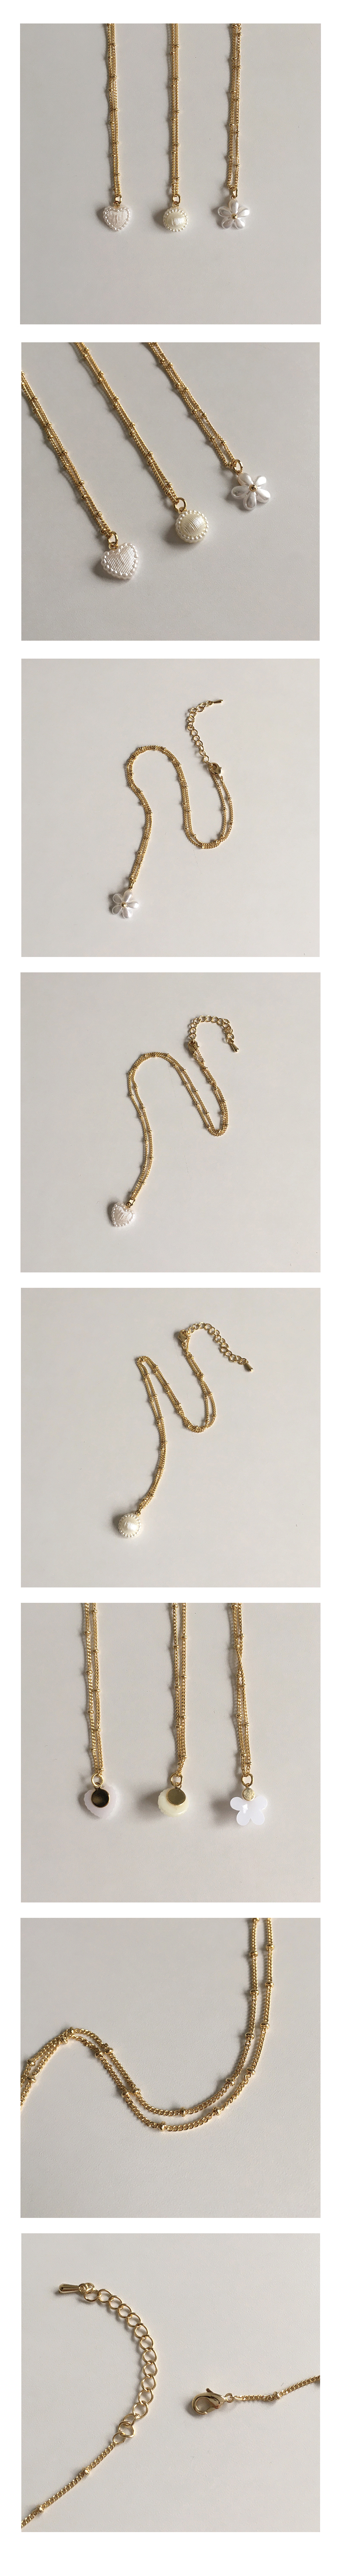 unique pearl necklace series